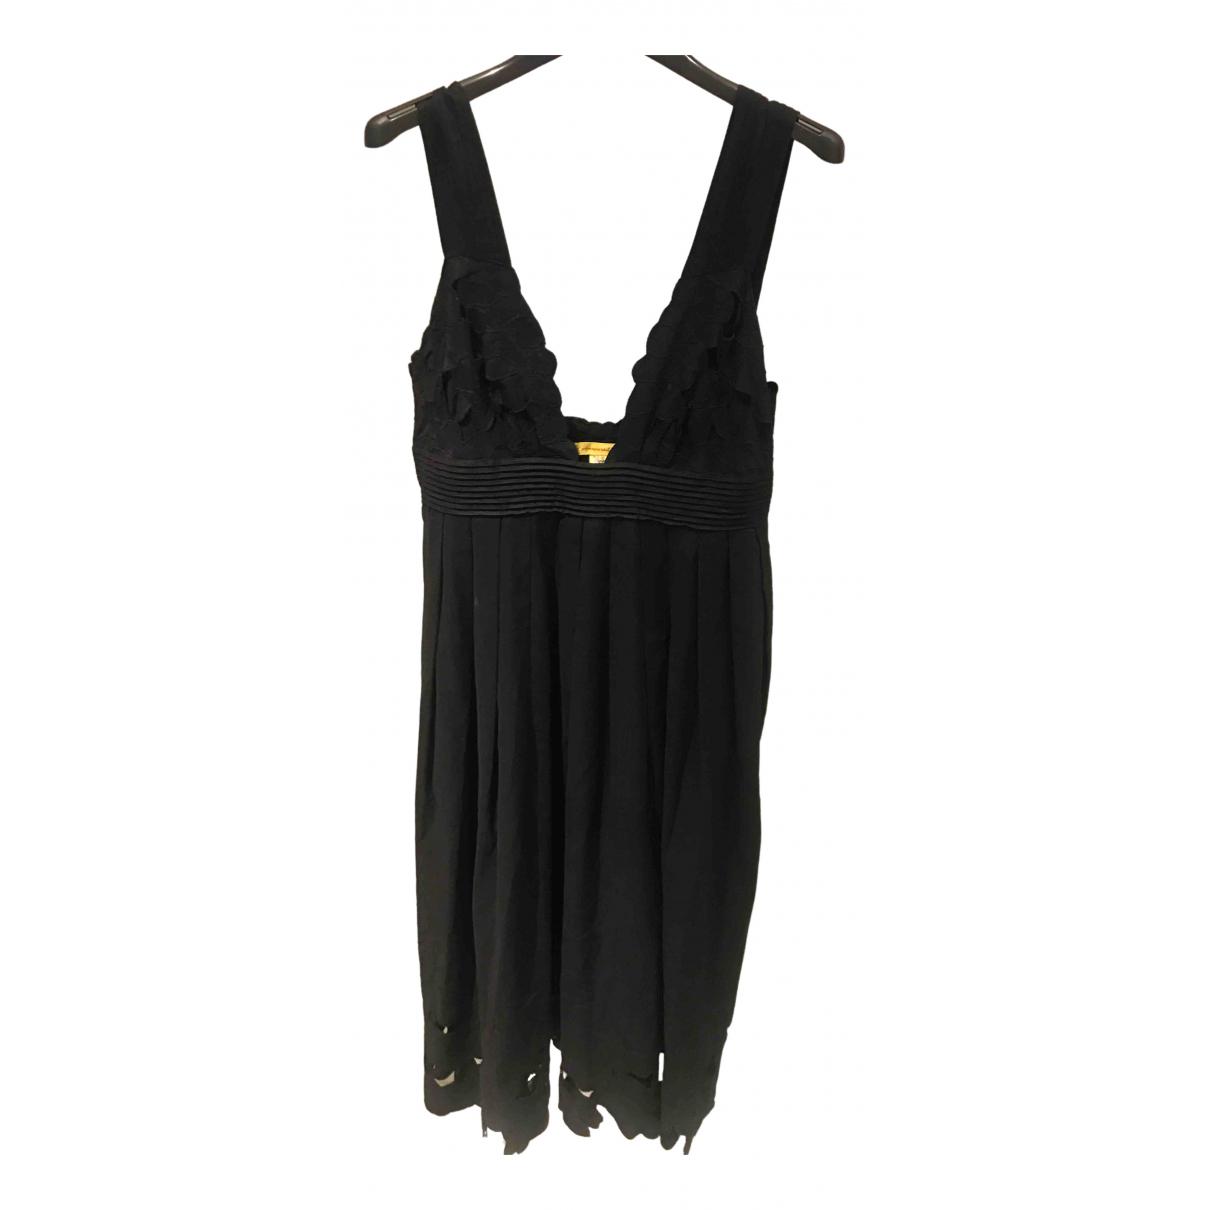 Catherine Malandrino \N Black Cotton dress for Women 8 US